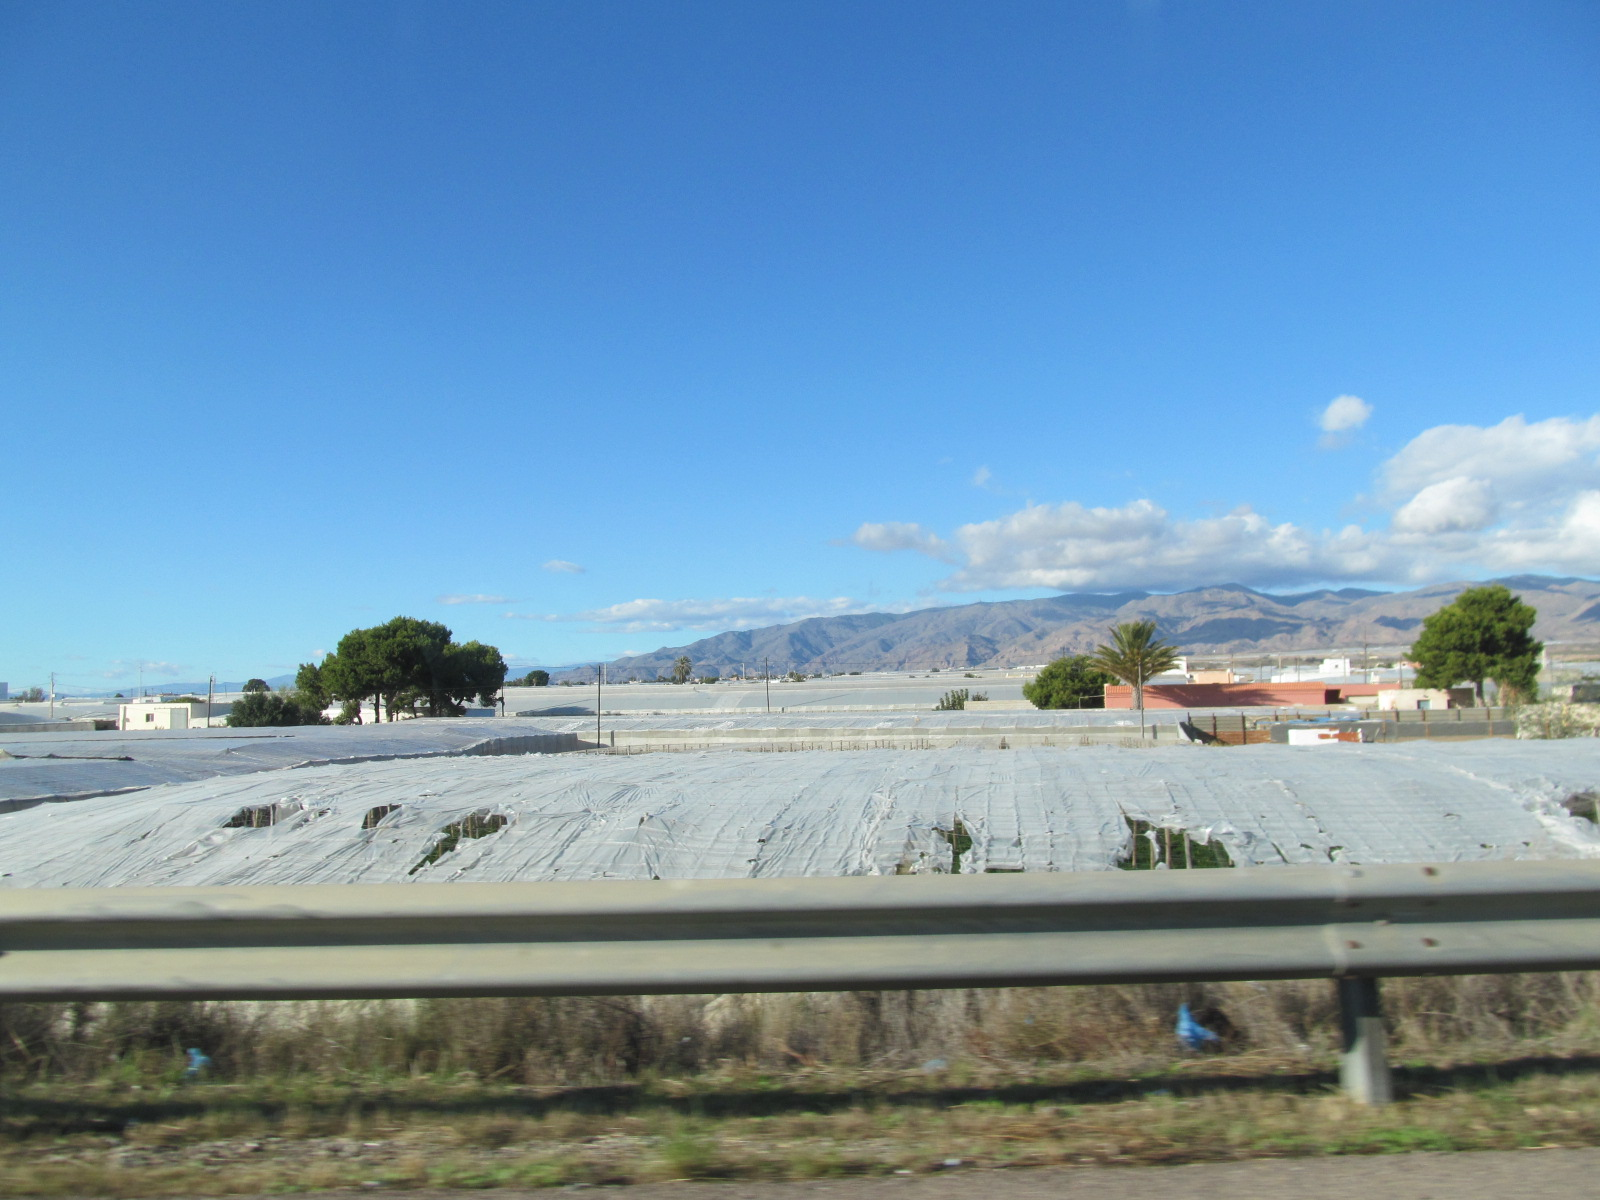 2 greenhouse